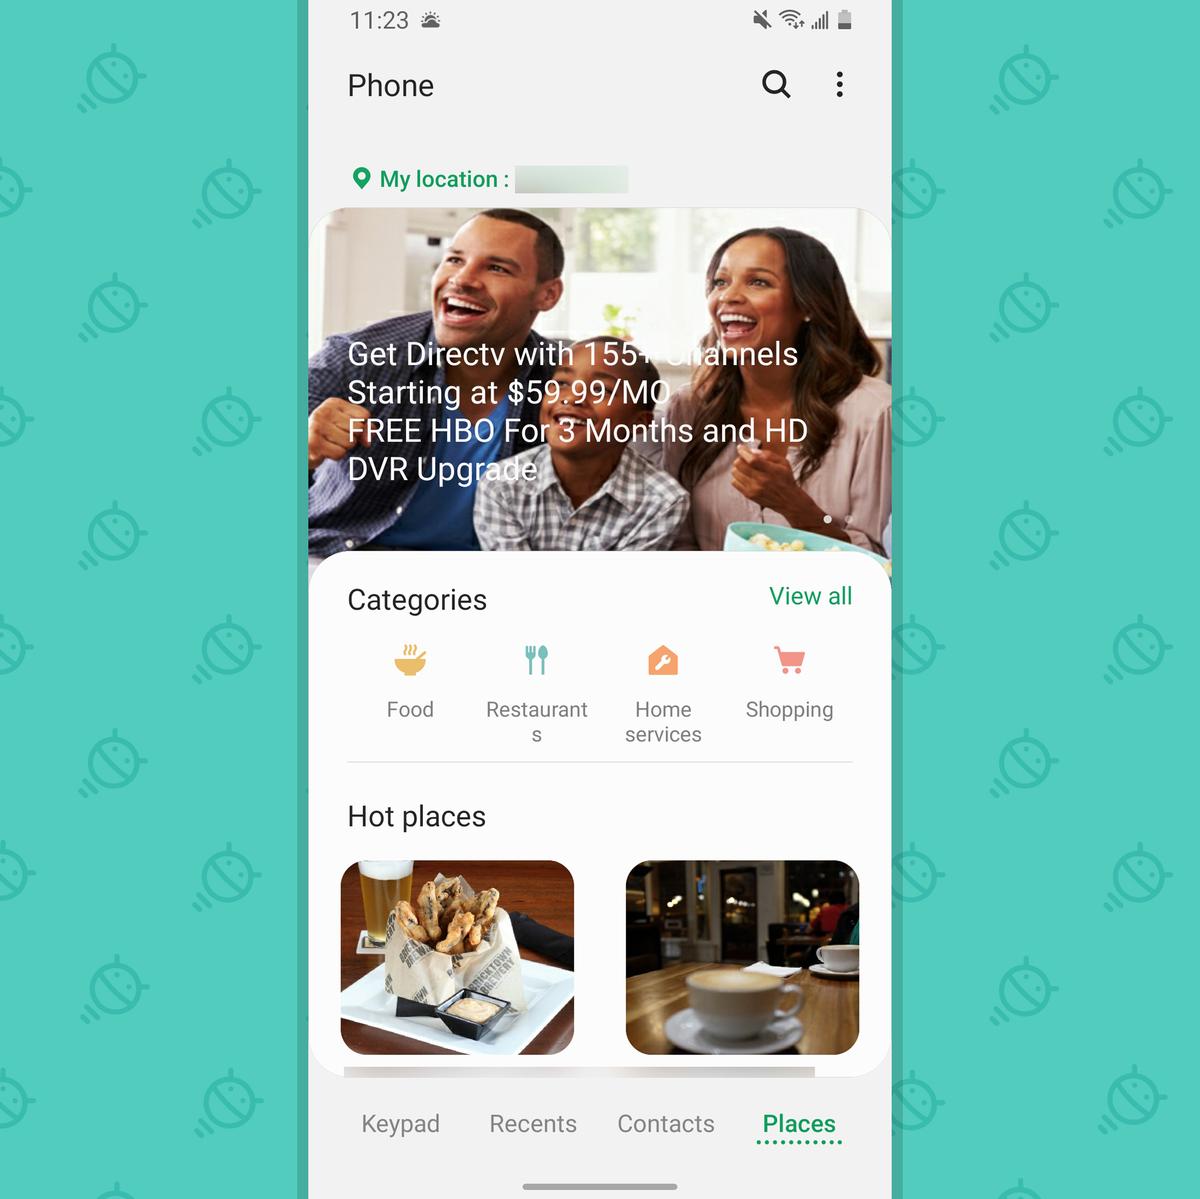 Samsung Phone App (4)